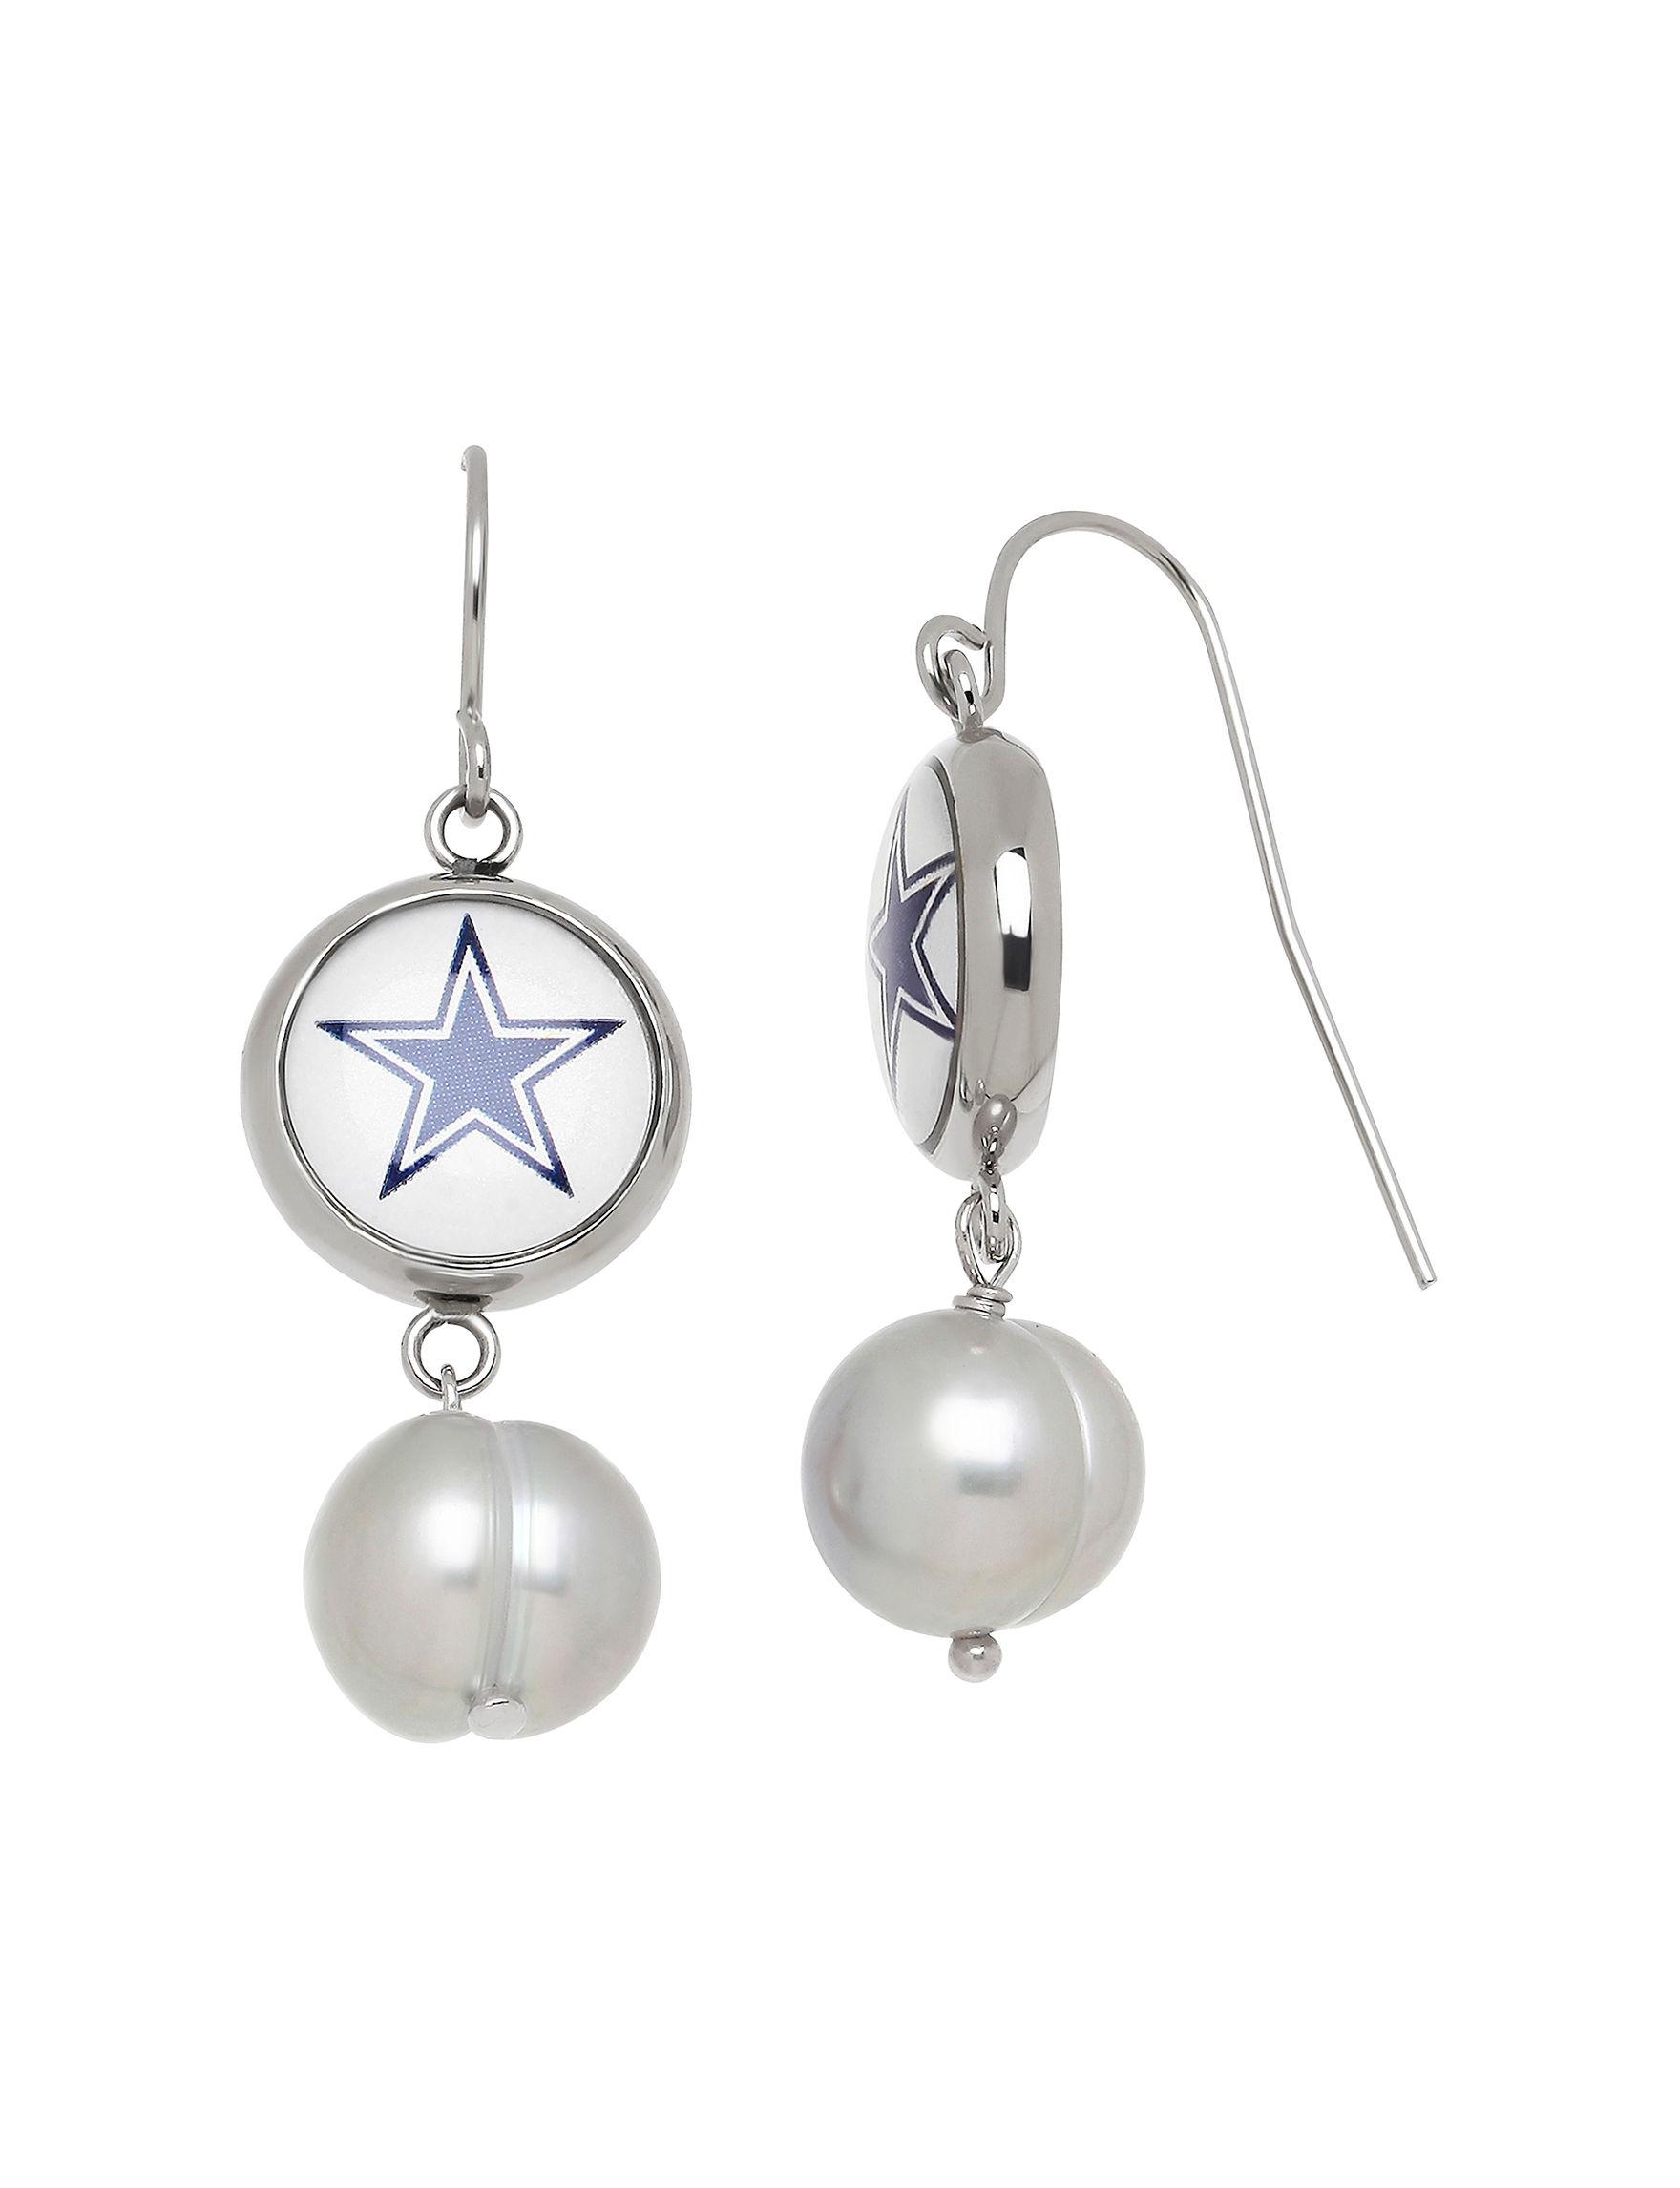 Aurafin Oro America Charcoal Drops Earrings Fashion Jewelry Fine Jewelry NFL